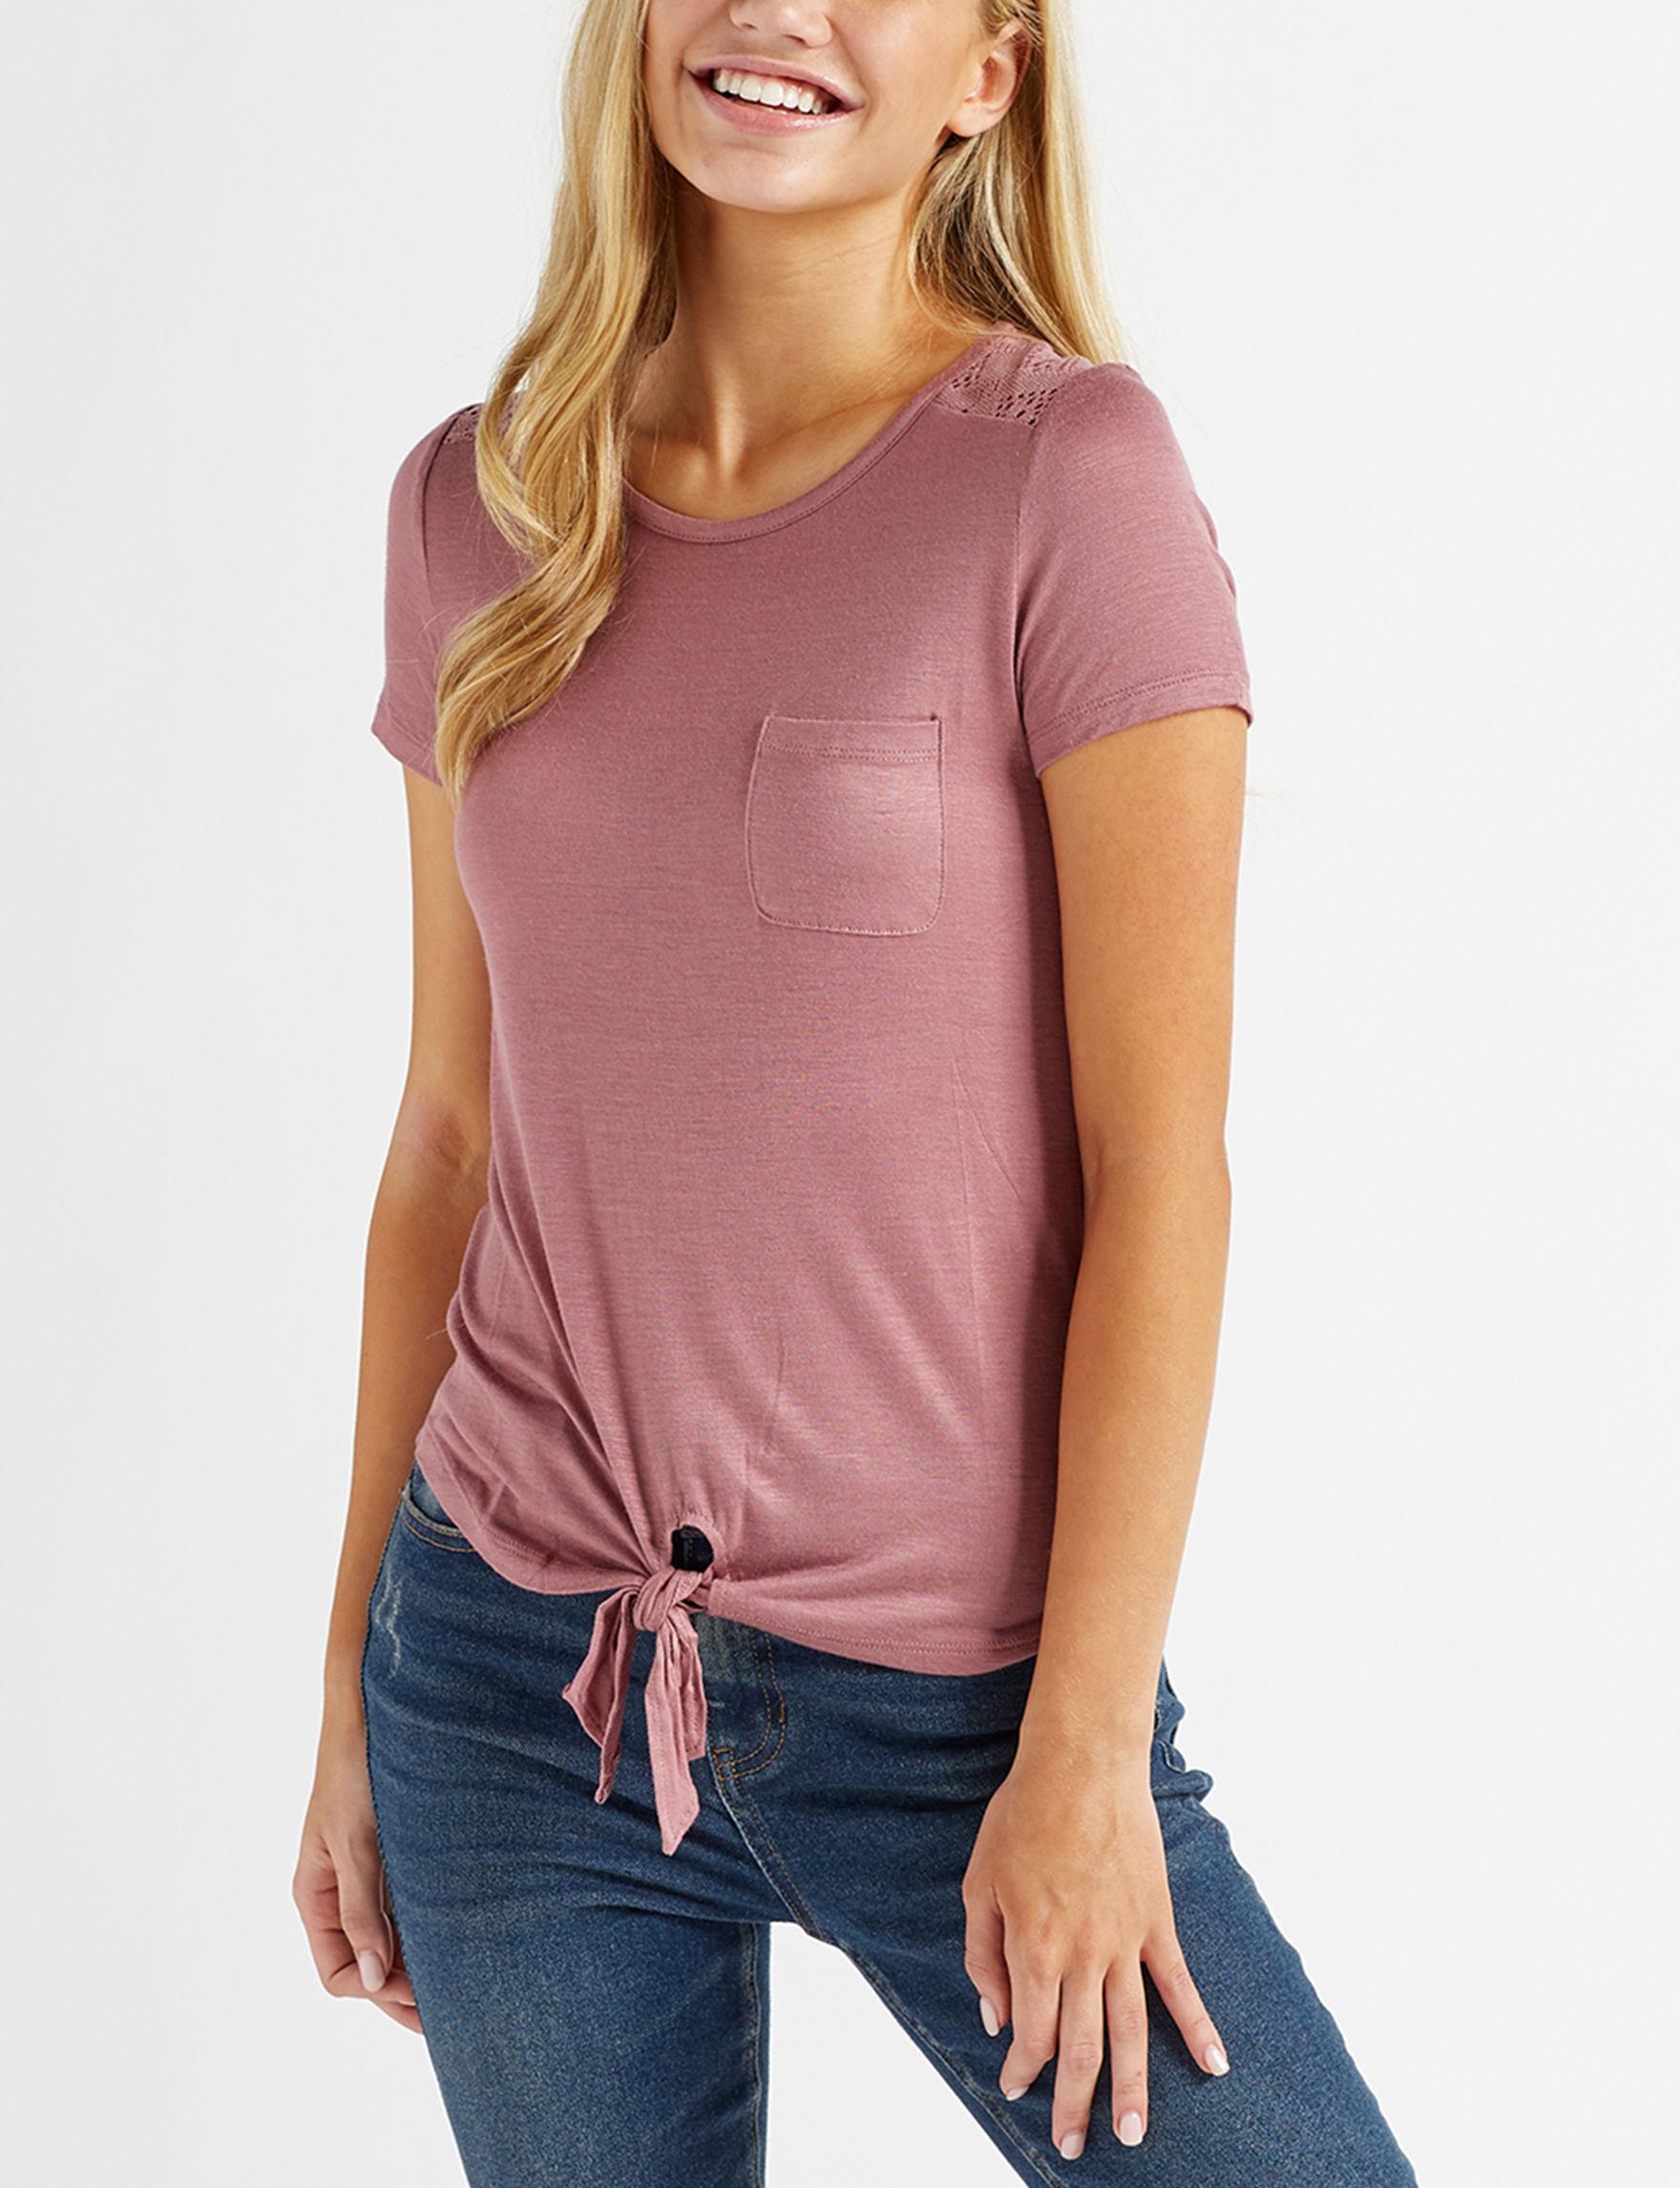 Glitz Pink Shirts & Blouses